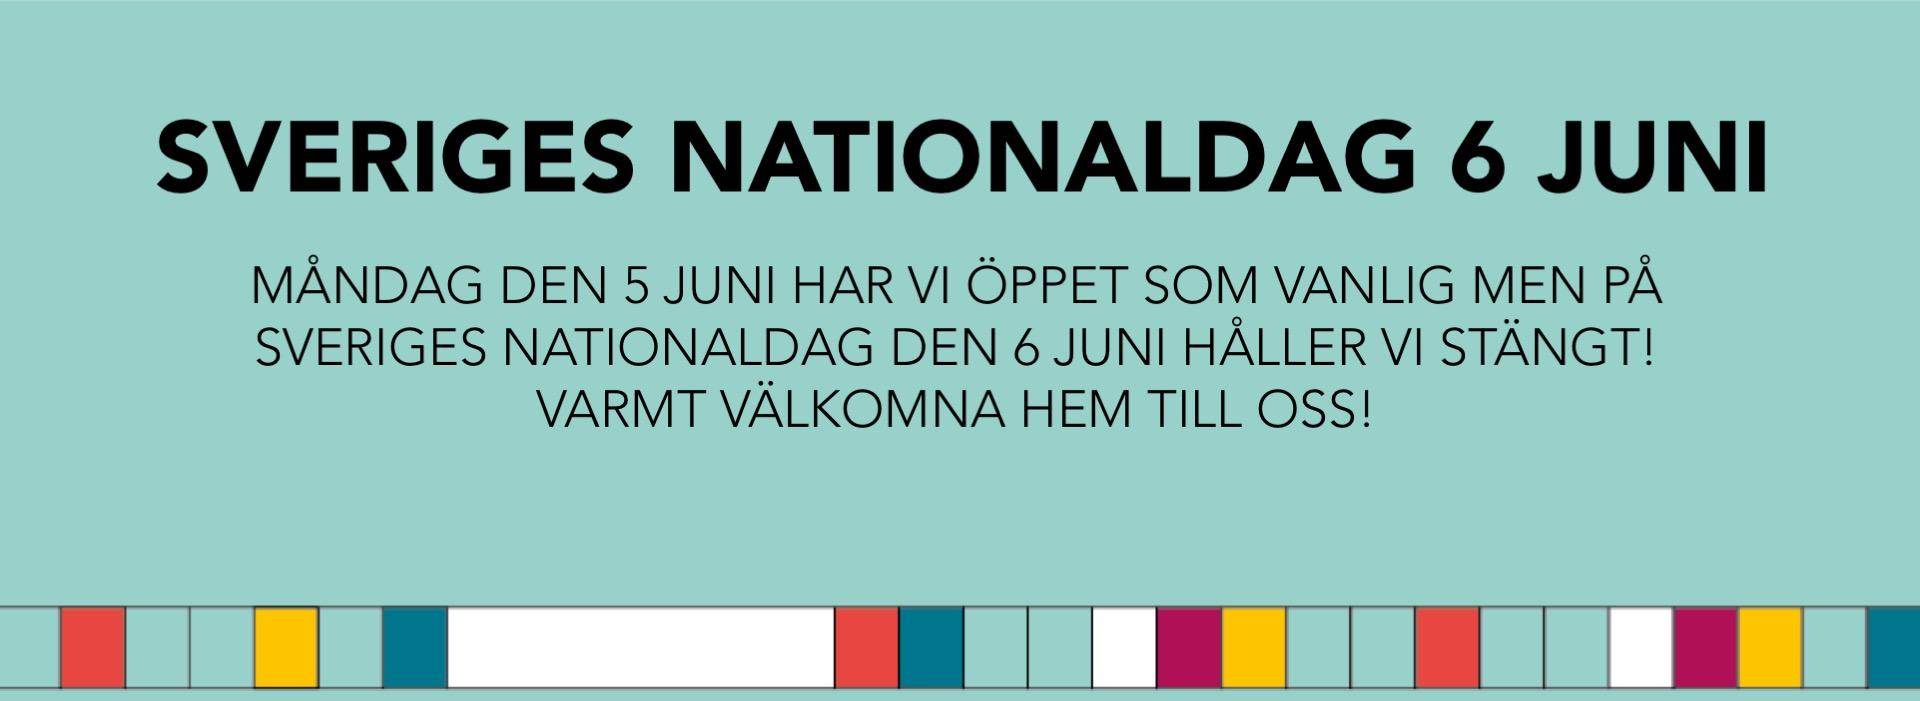 SVERIGES-NATIONALDAG-